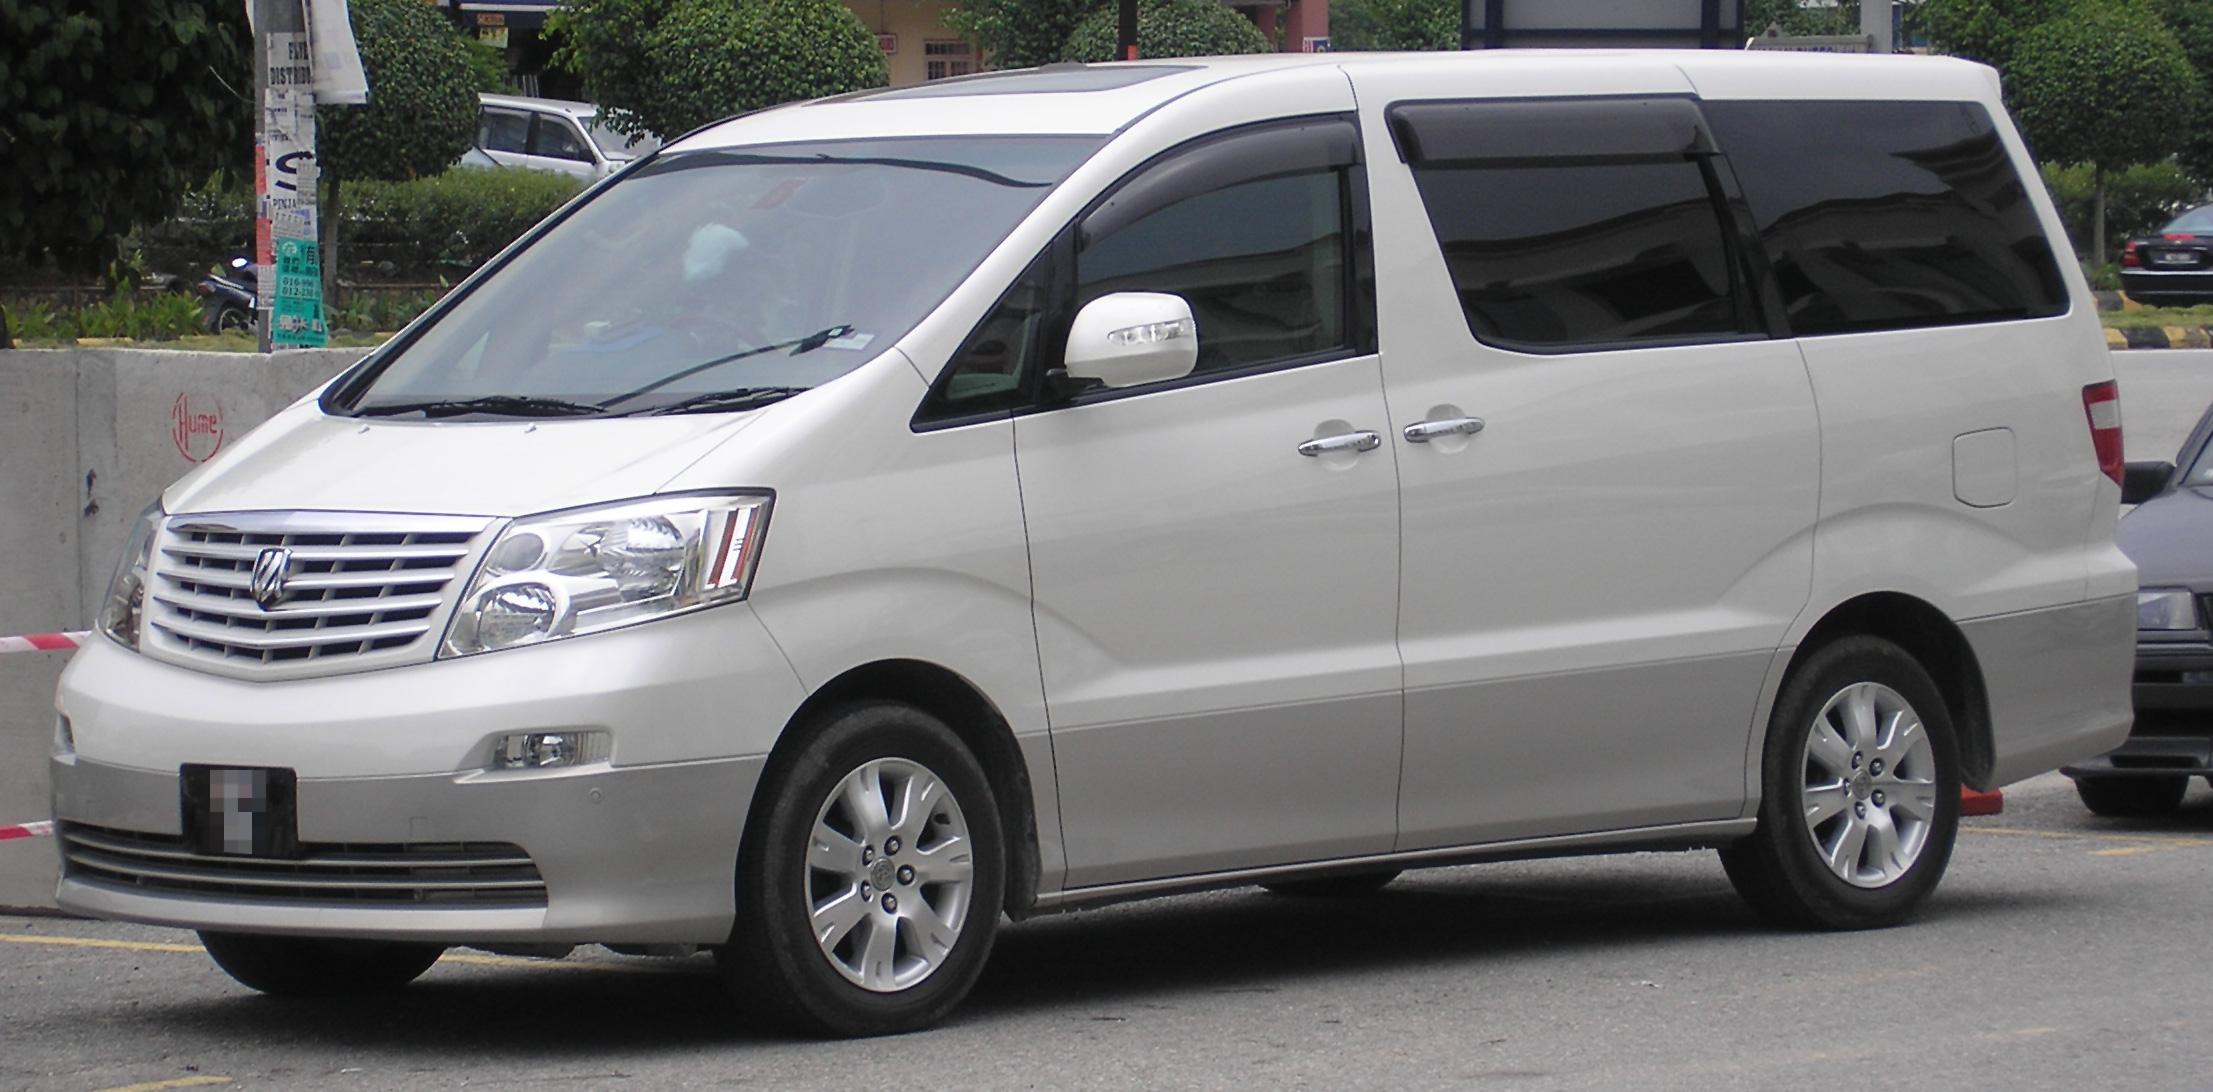 all new alphard 2017 indonesia harga bumper depan grand veloz toyota wikipedia first generation front white serdang jpg